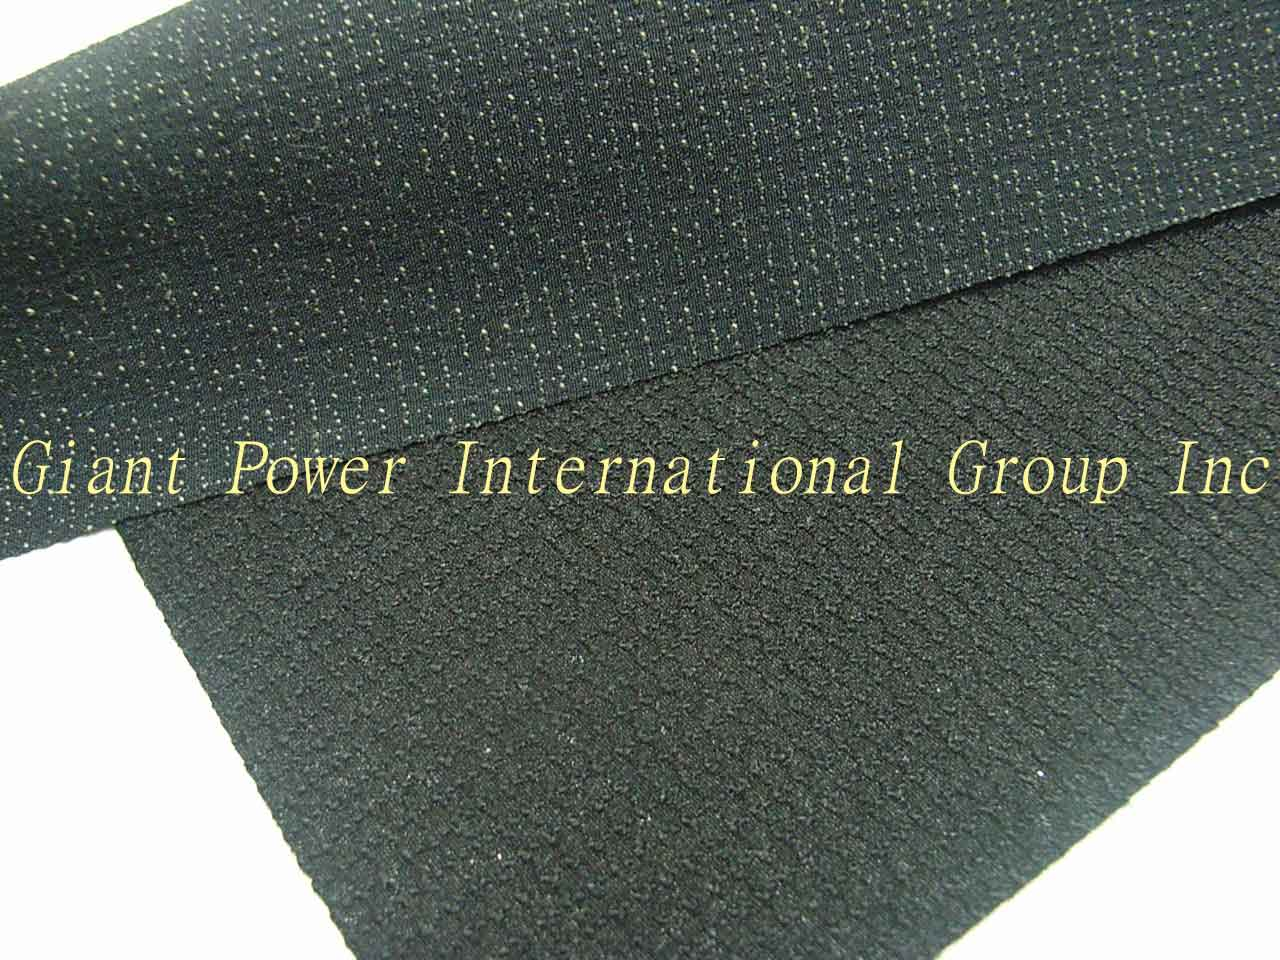 Abrasion Resistant Kevlar Fabric